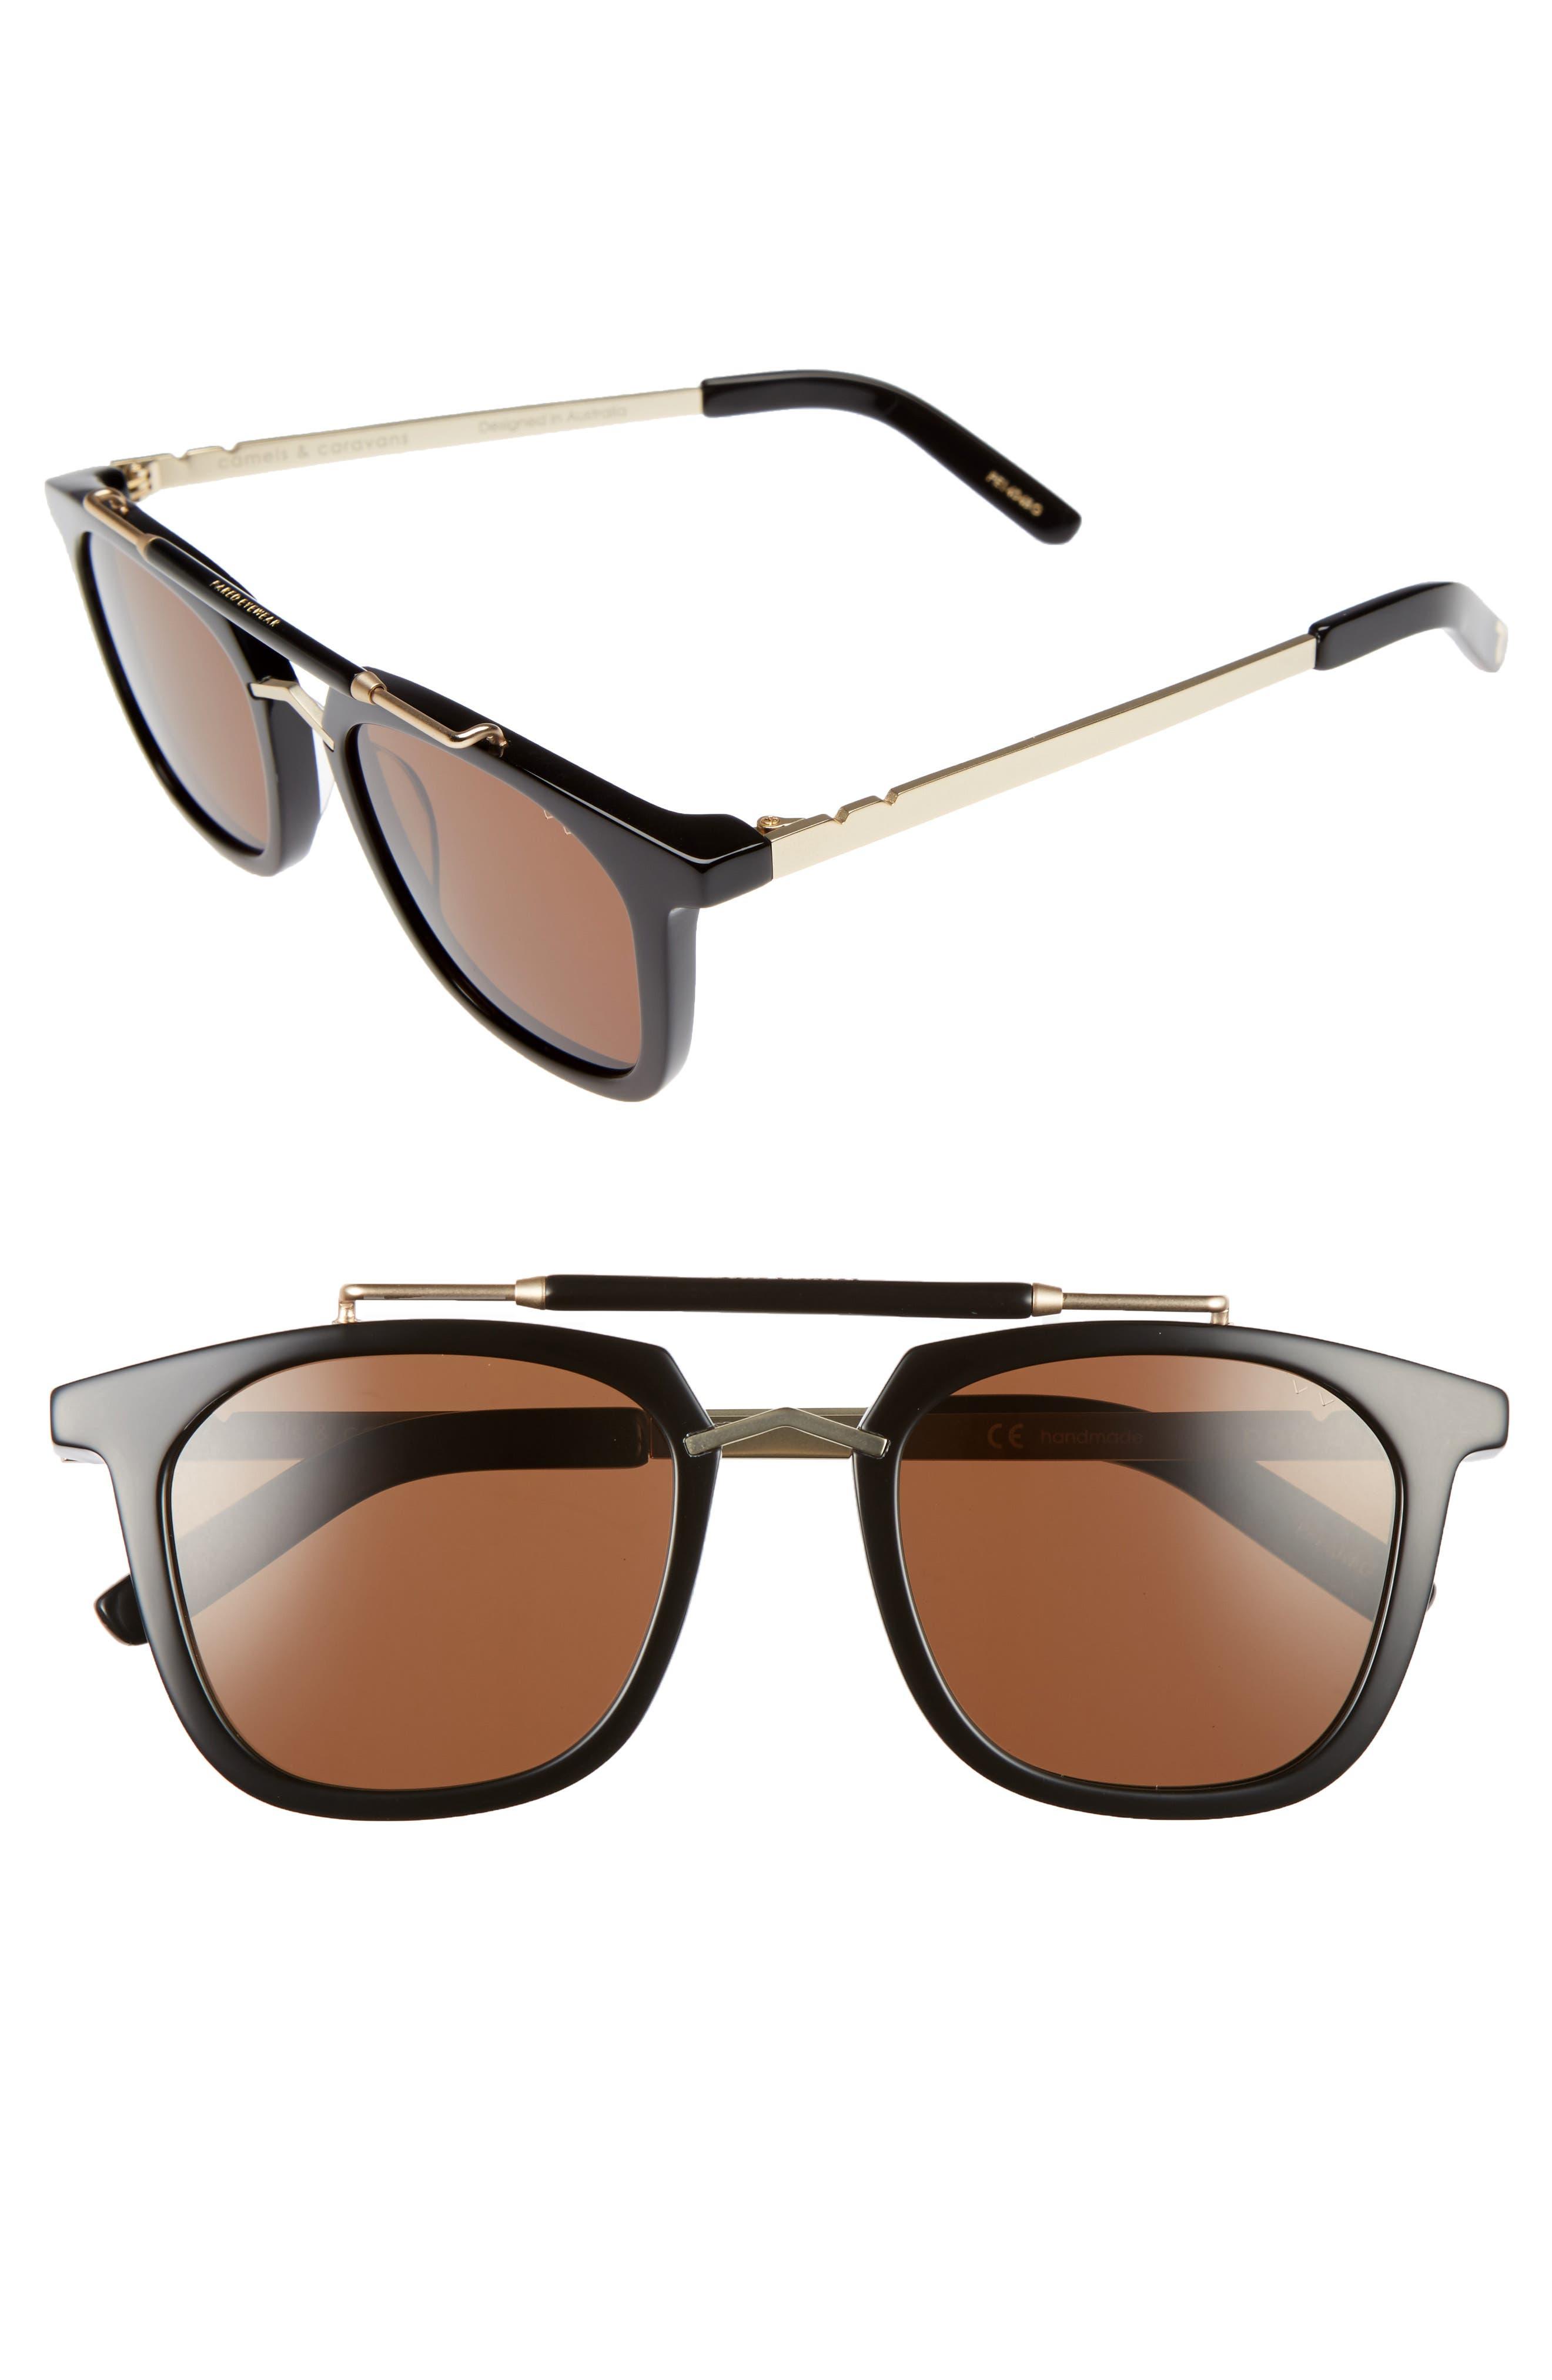 Camels & Caravans 50mm Retro Sunglasses,                             Main thumbnail 1, color,                             BLACK/ GOLD BROWN